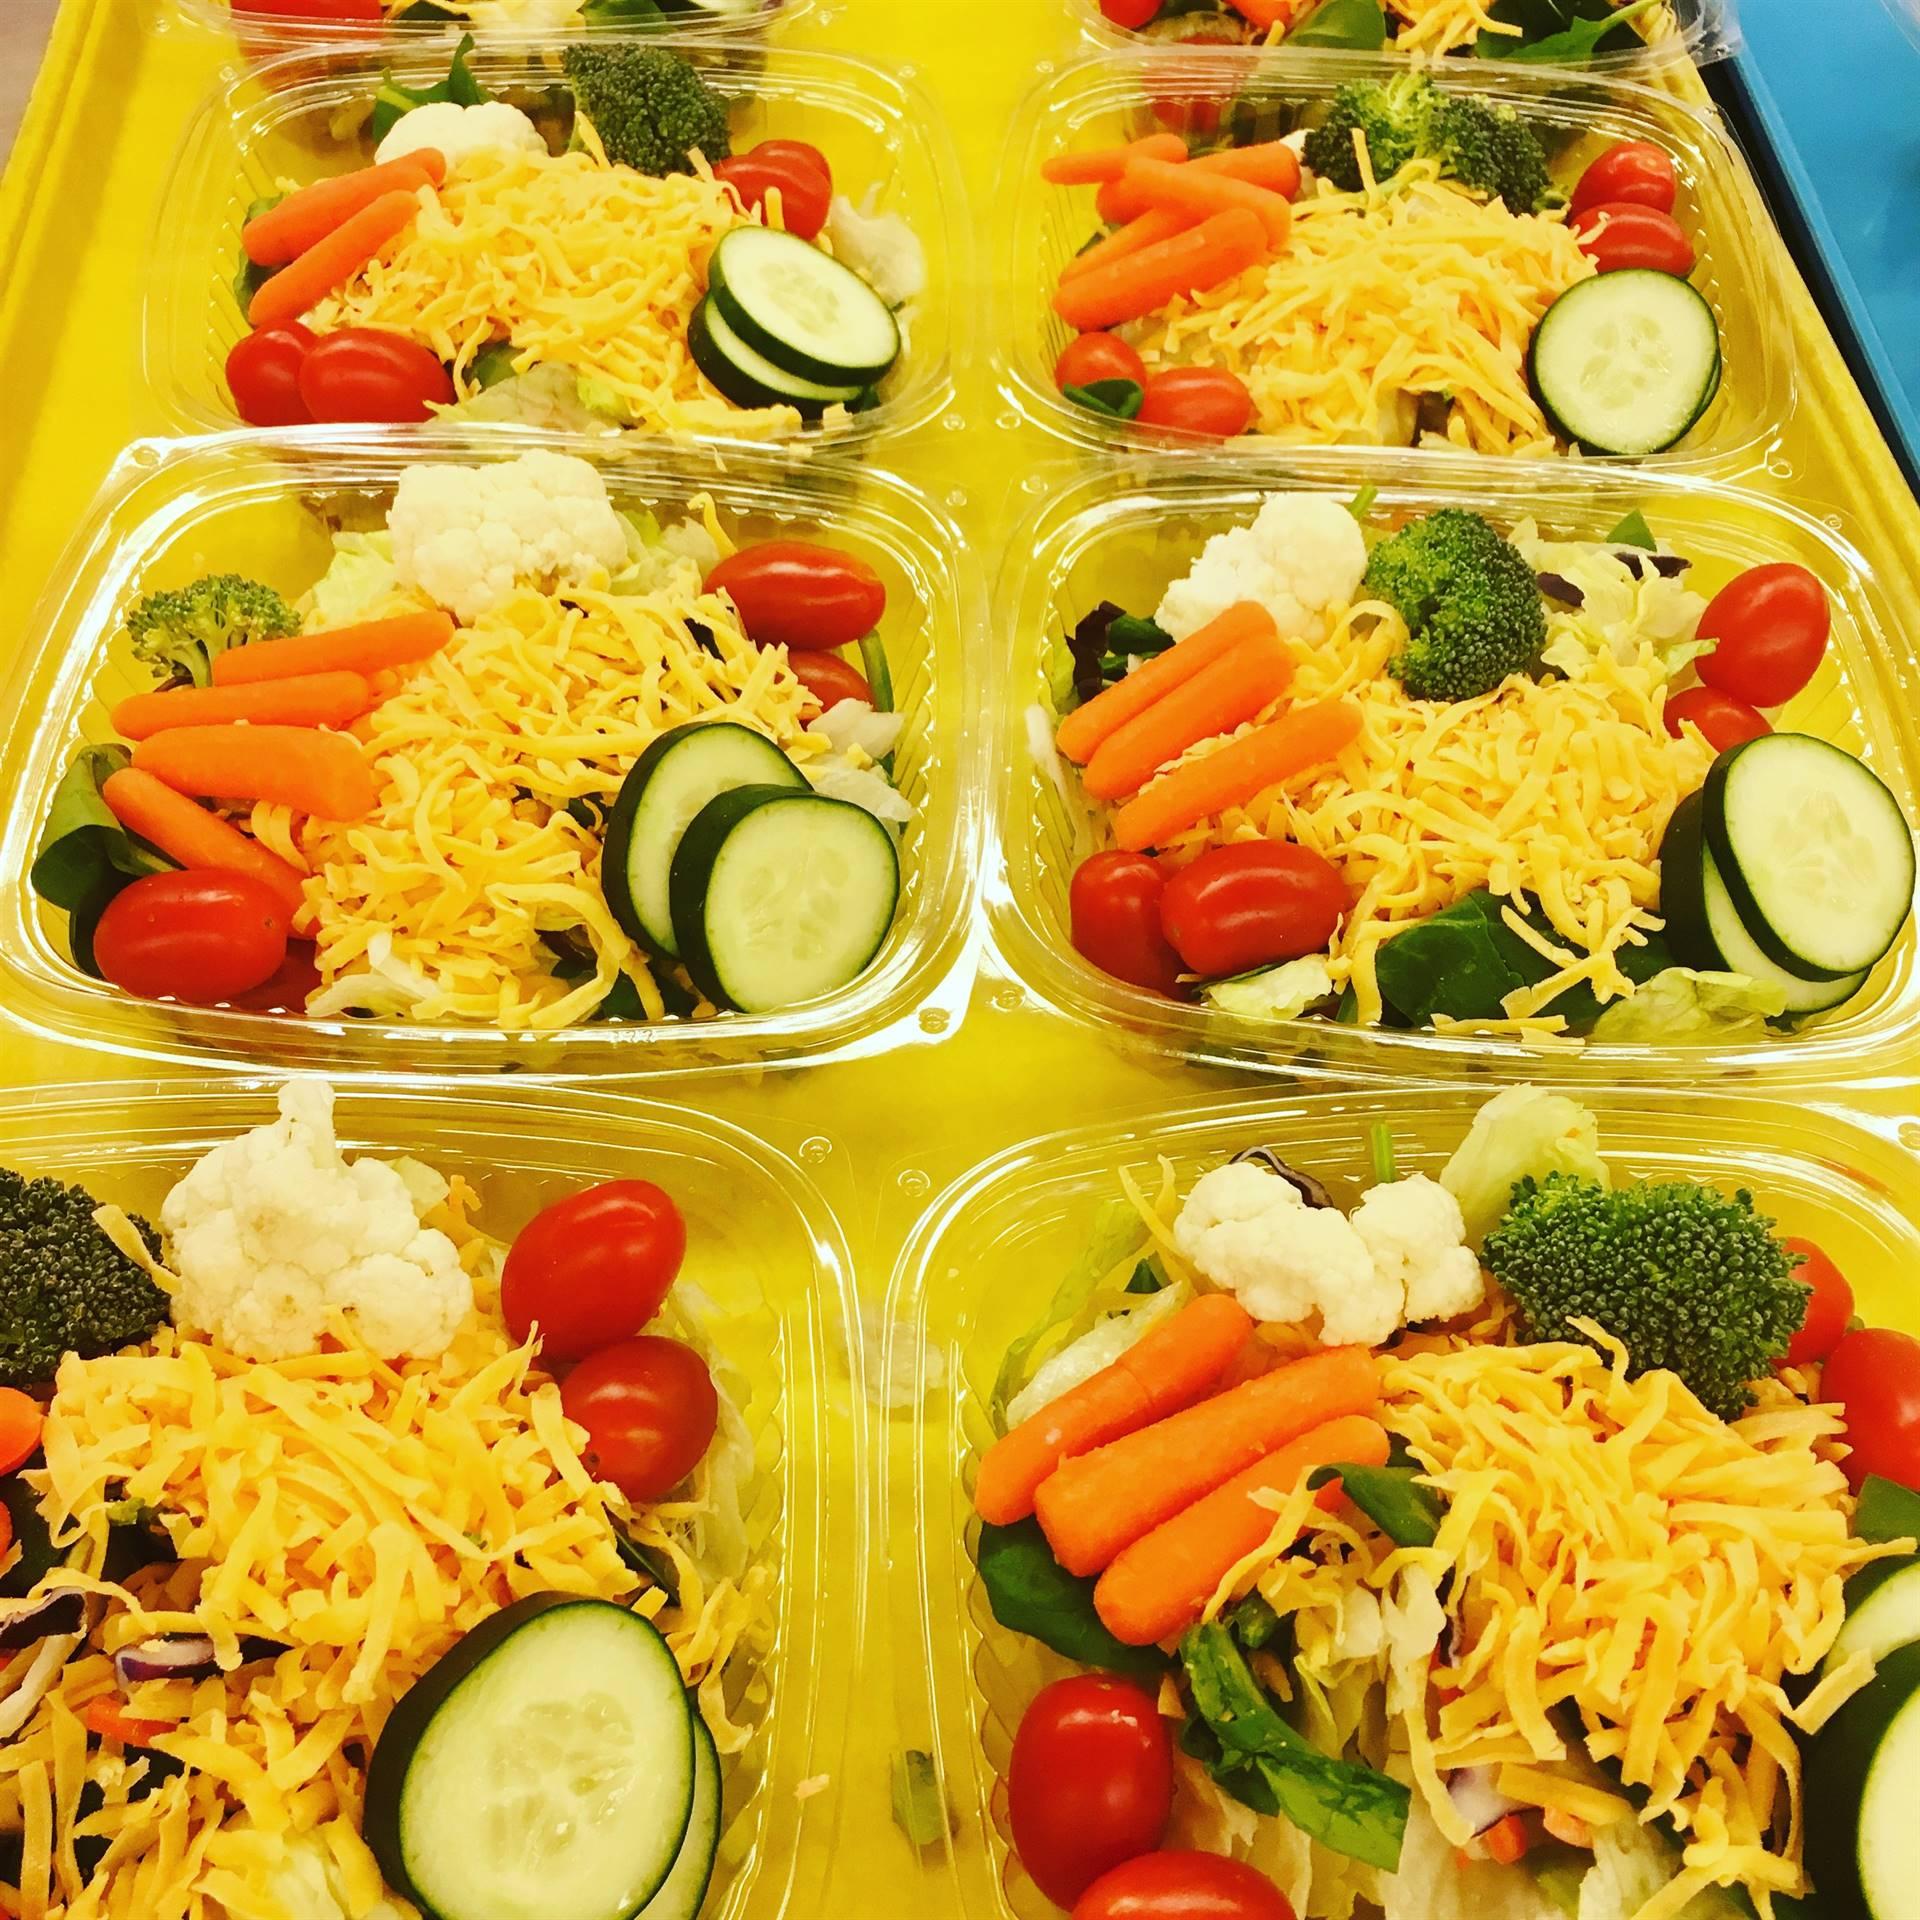 High School salads